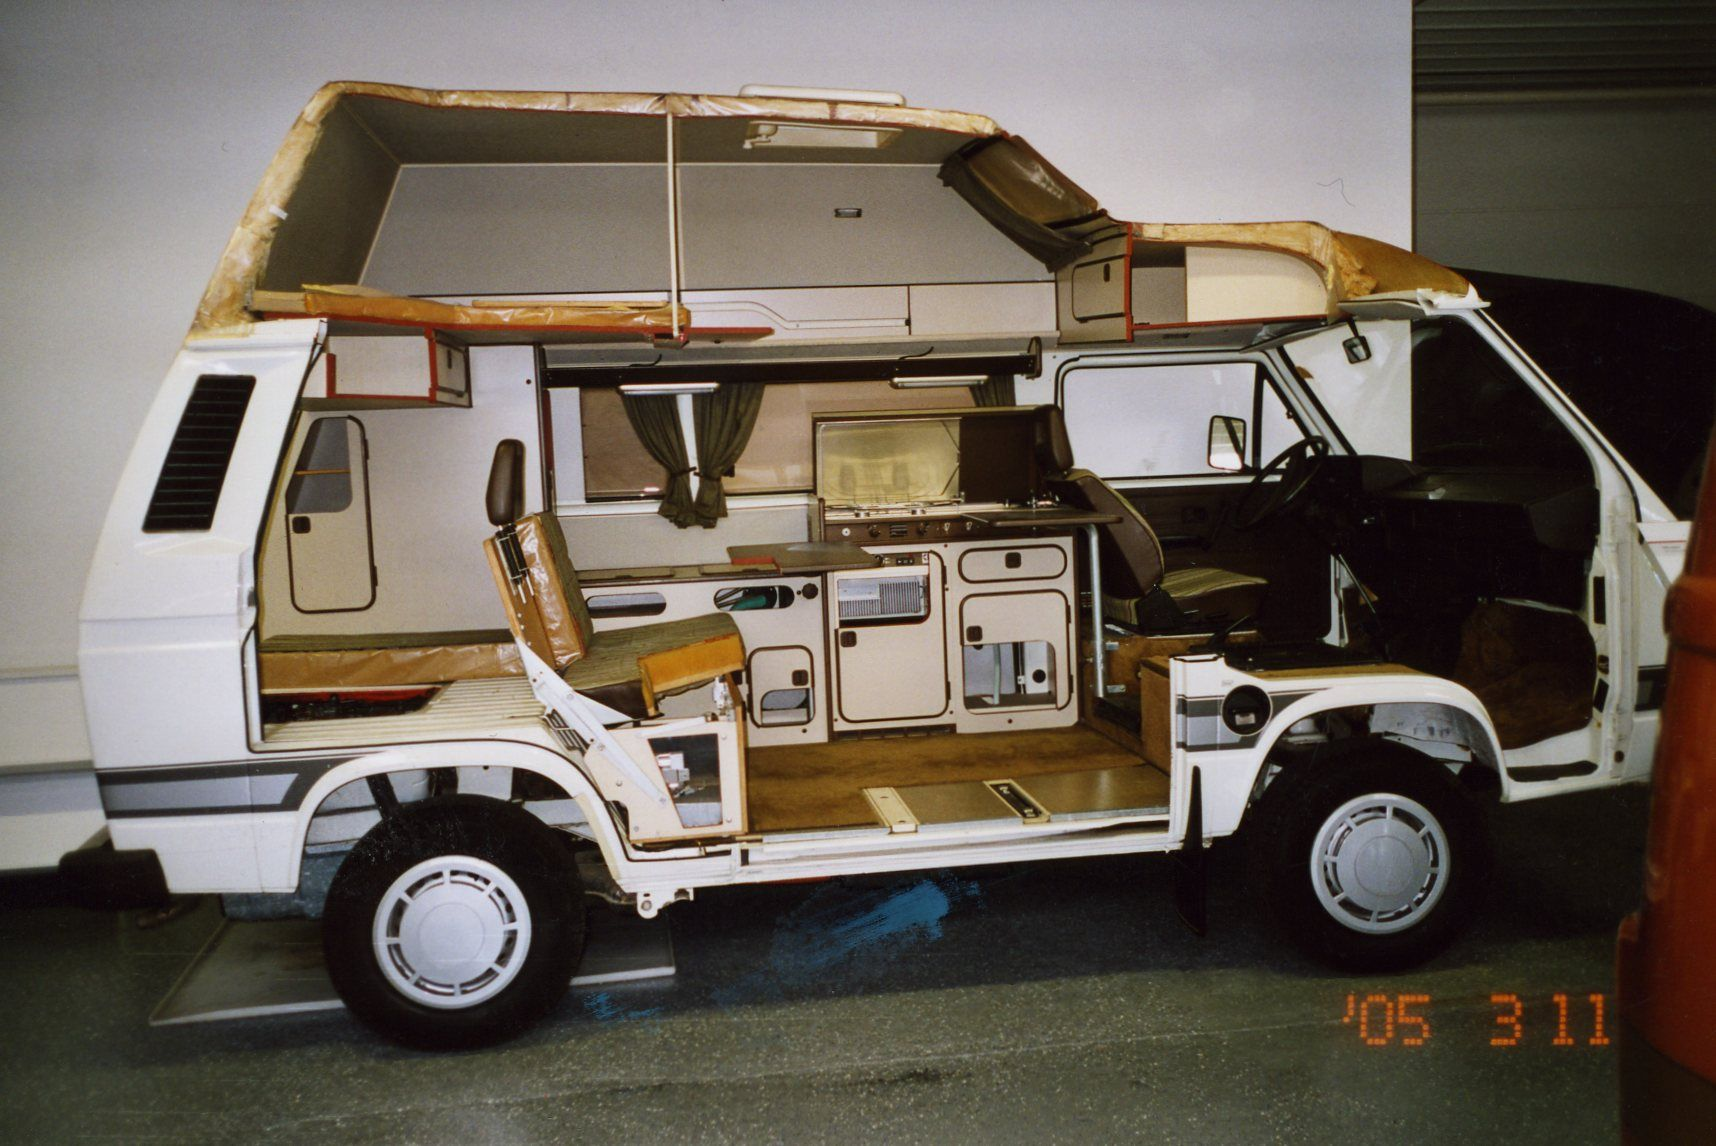 westfalia google search volkswagen t25 volkswagen. Black Bedroom Furniture Sets. Home Design Ideas